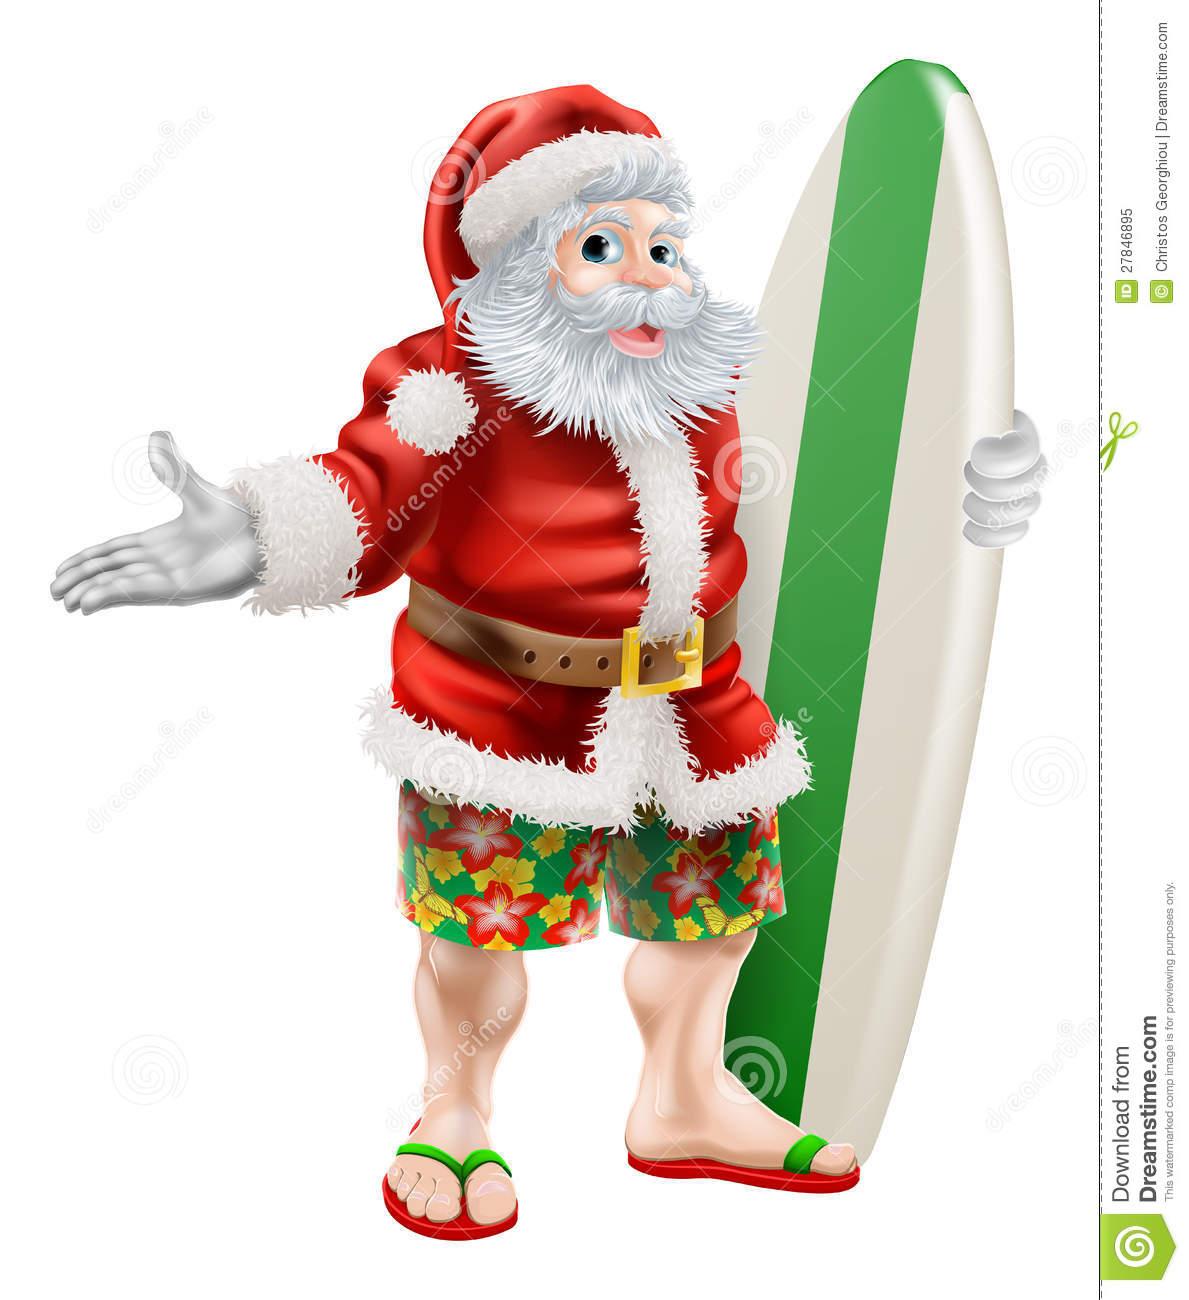 Santa on a surfboard clipart banner free Santa on a surfboard clipart - ClipartFest banner free